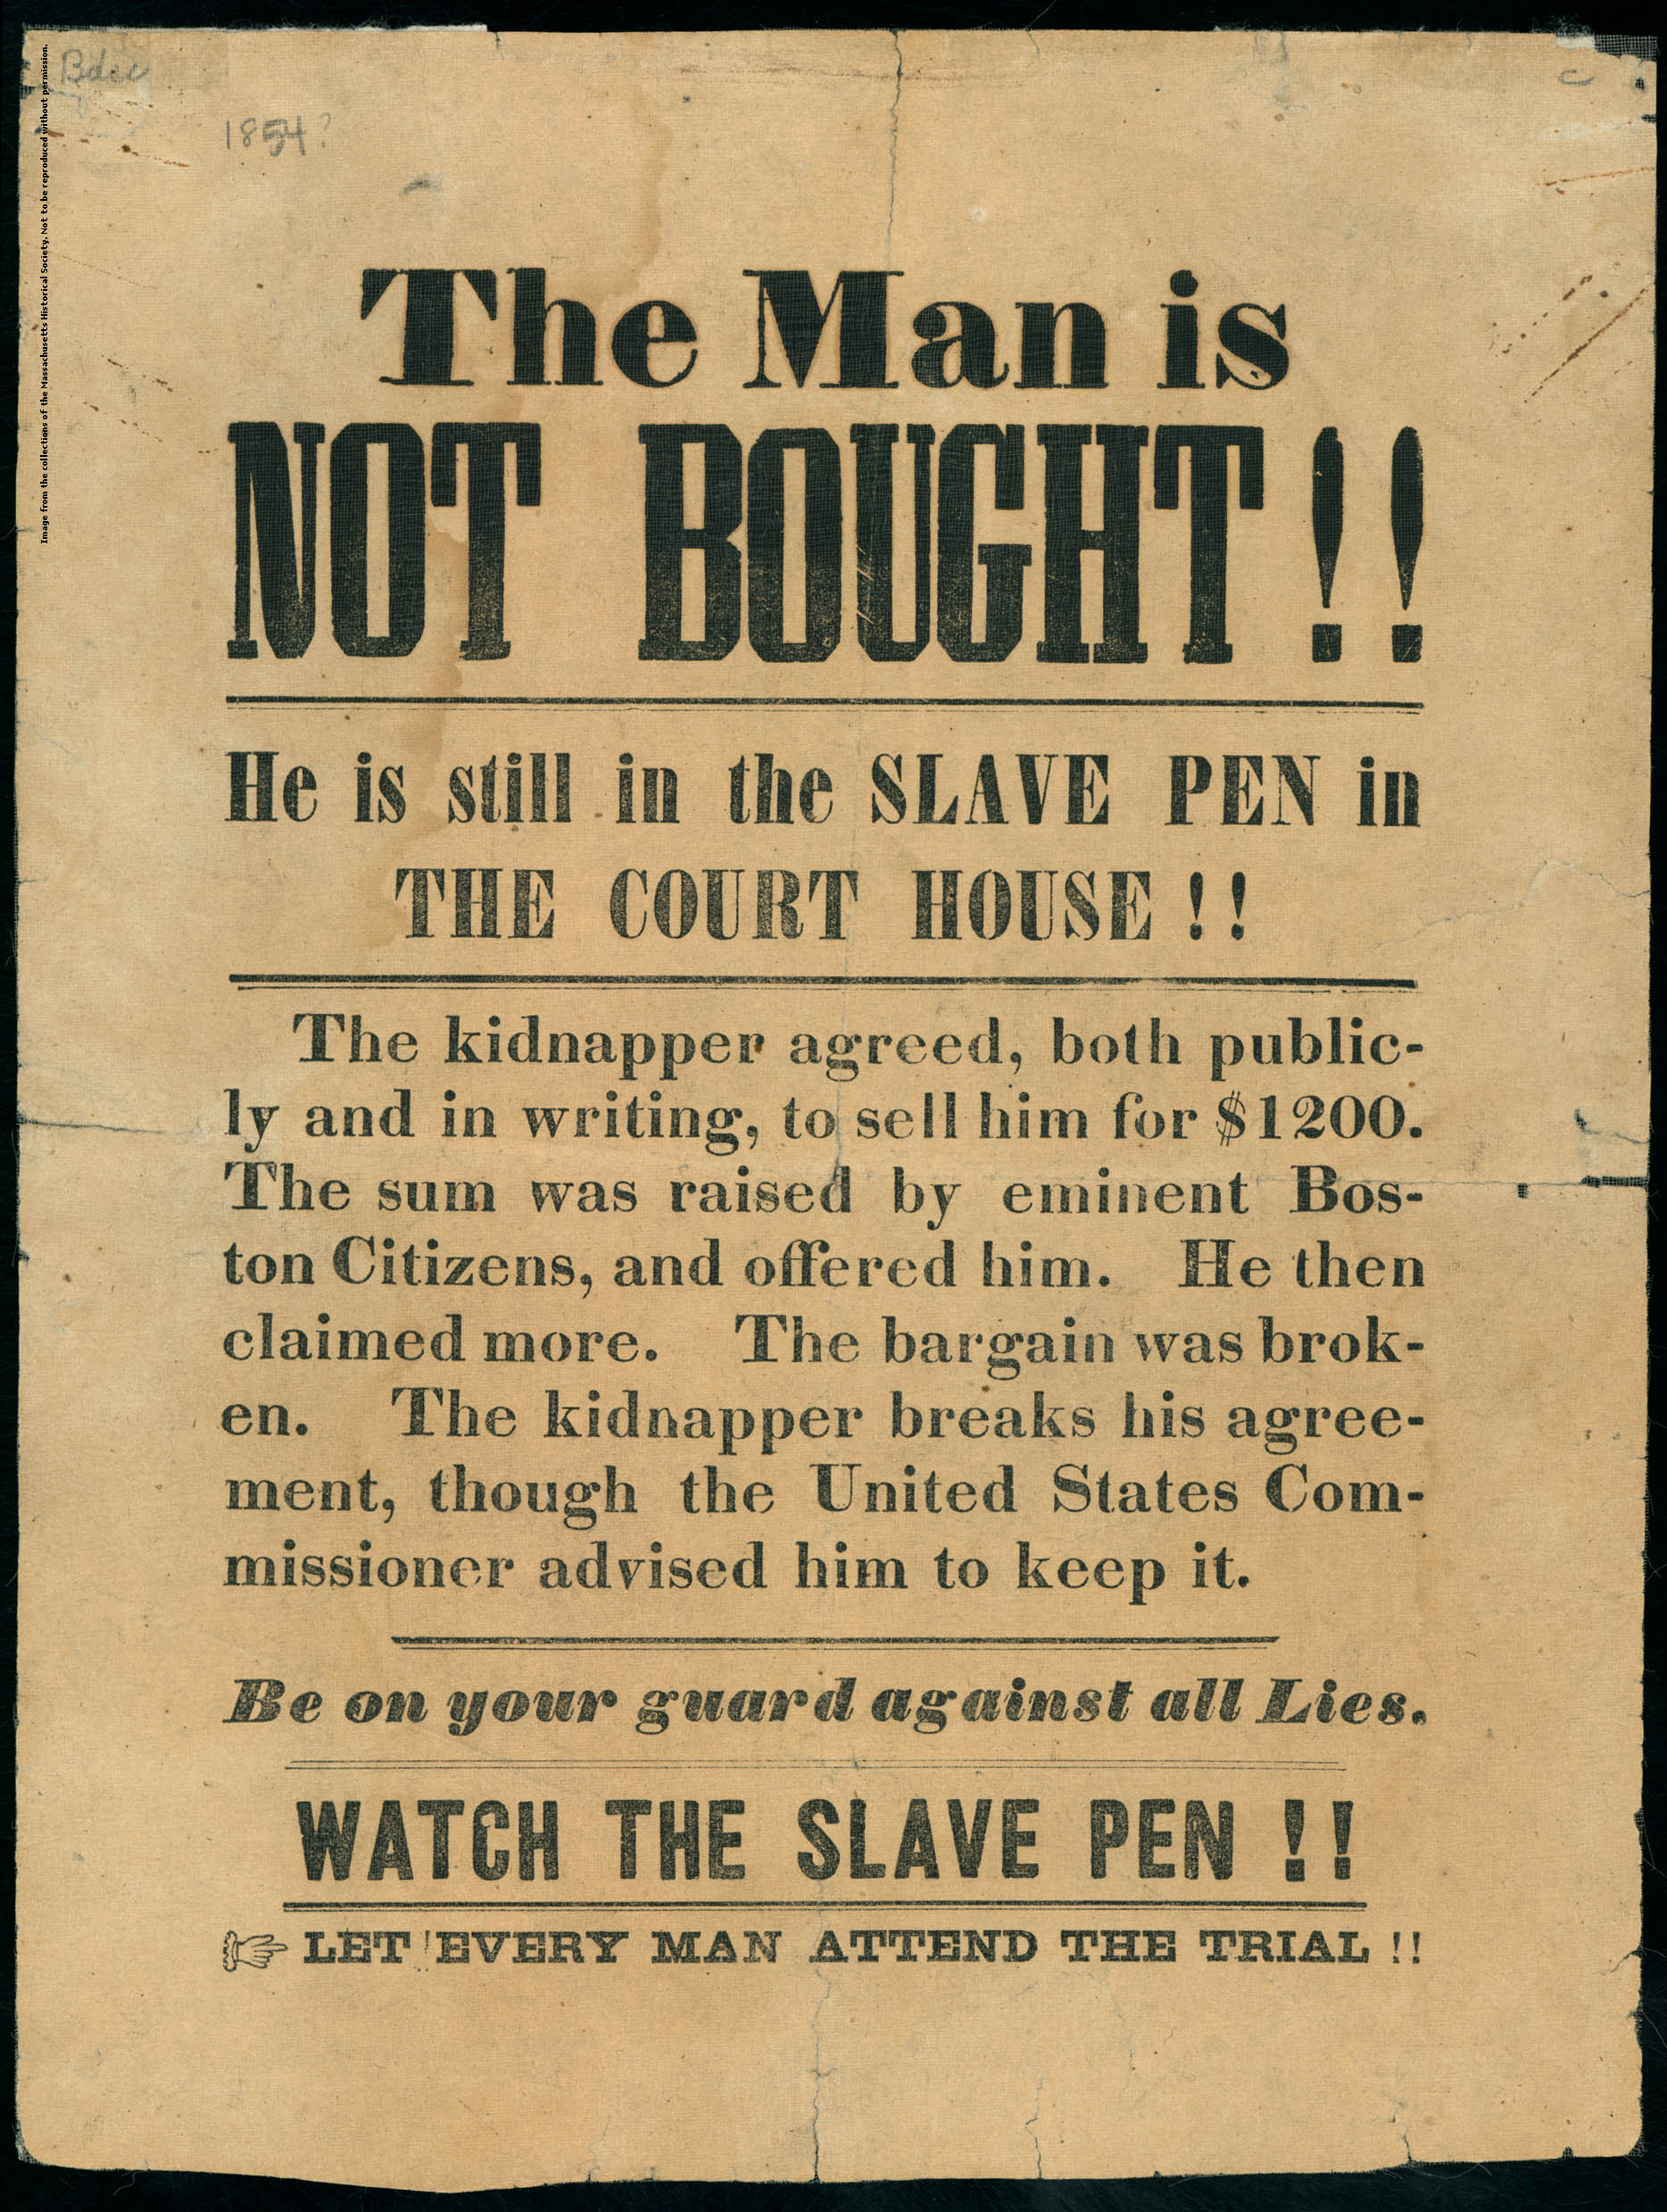 Fugitive Slave Act Quotes. QuotesGram